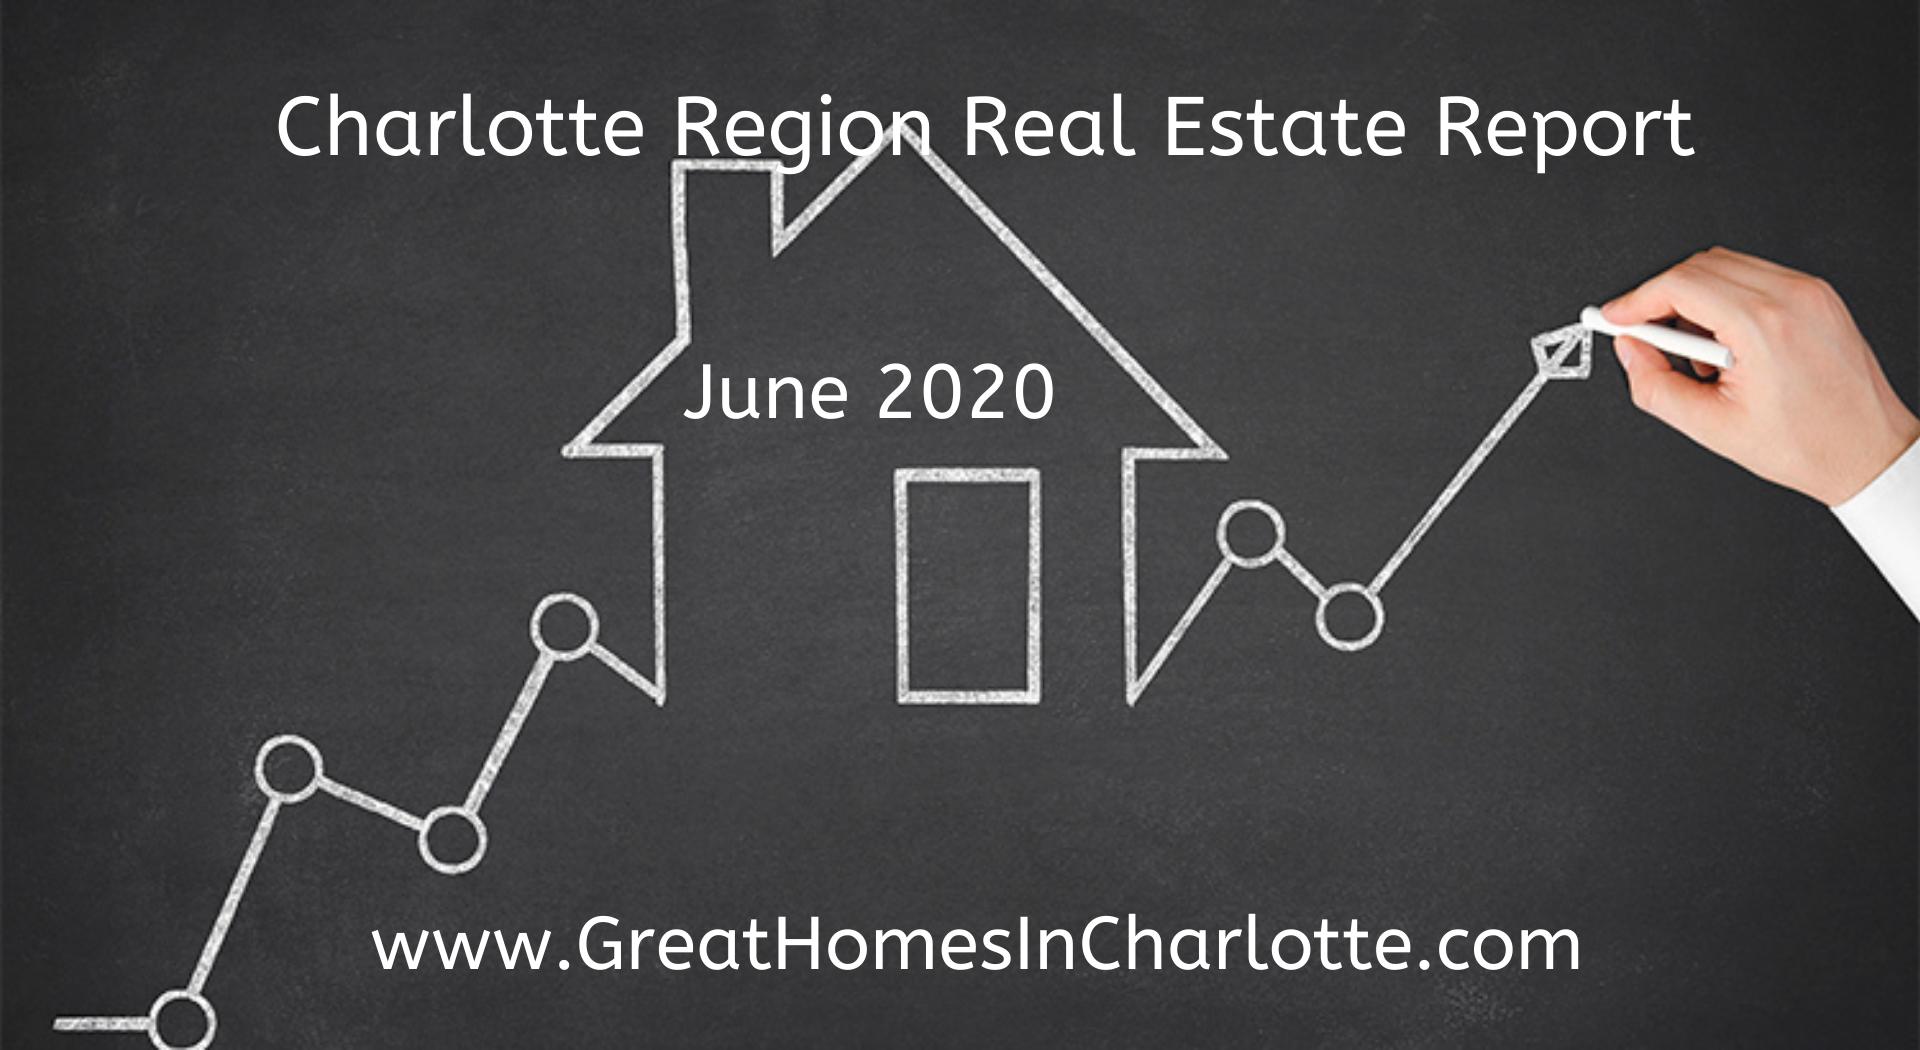 Charlotte Region Real Estate Report: June 2020